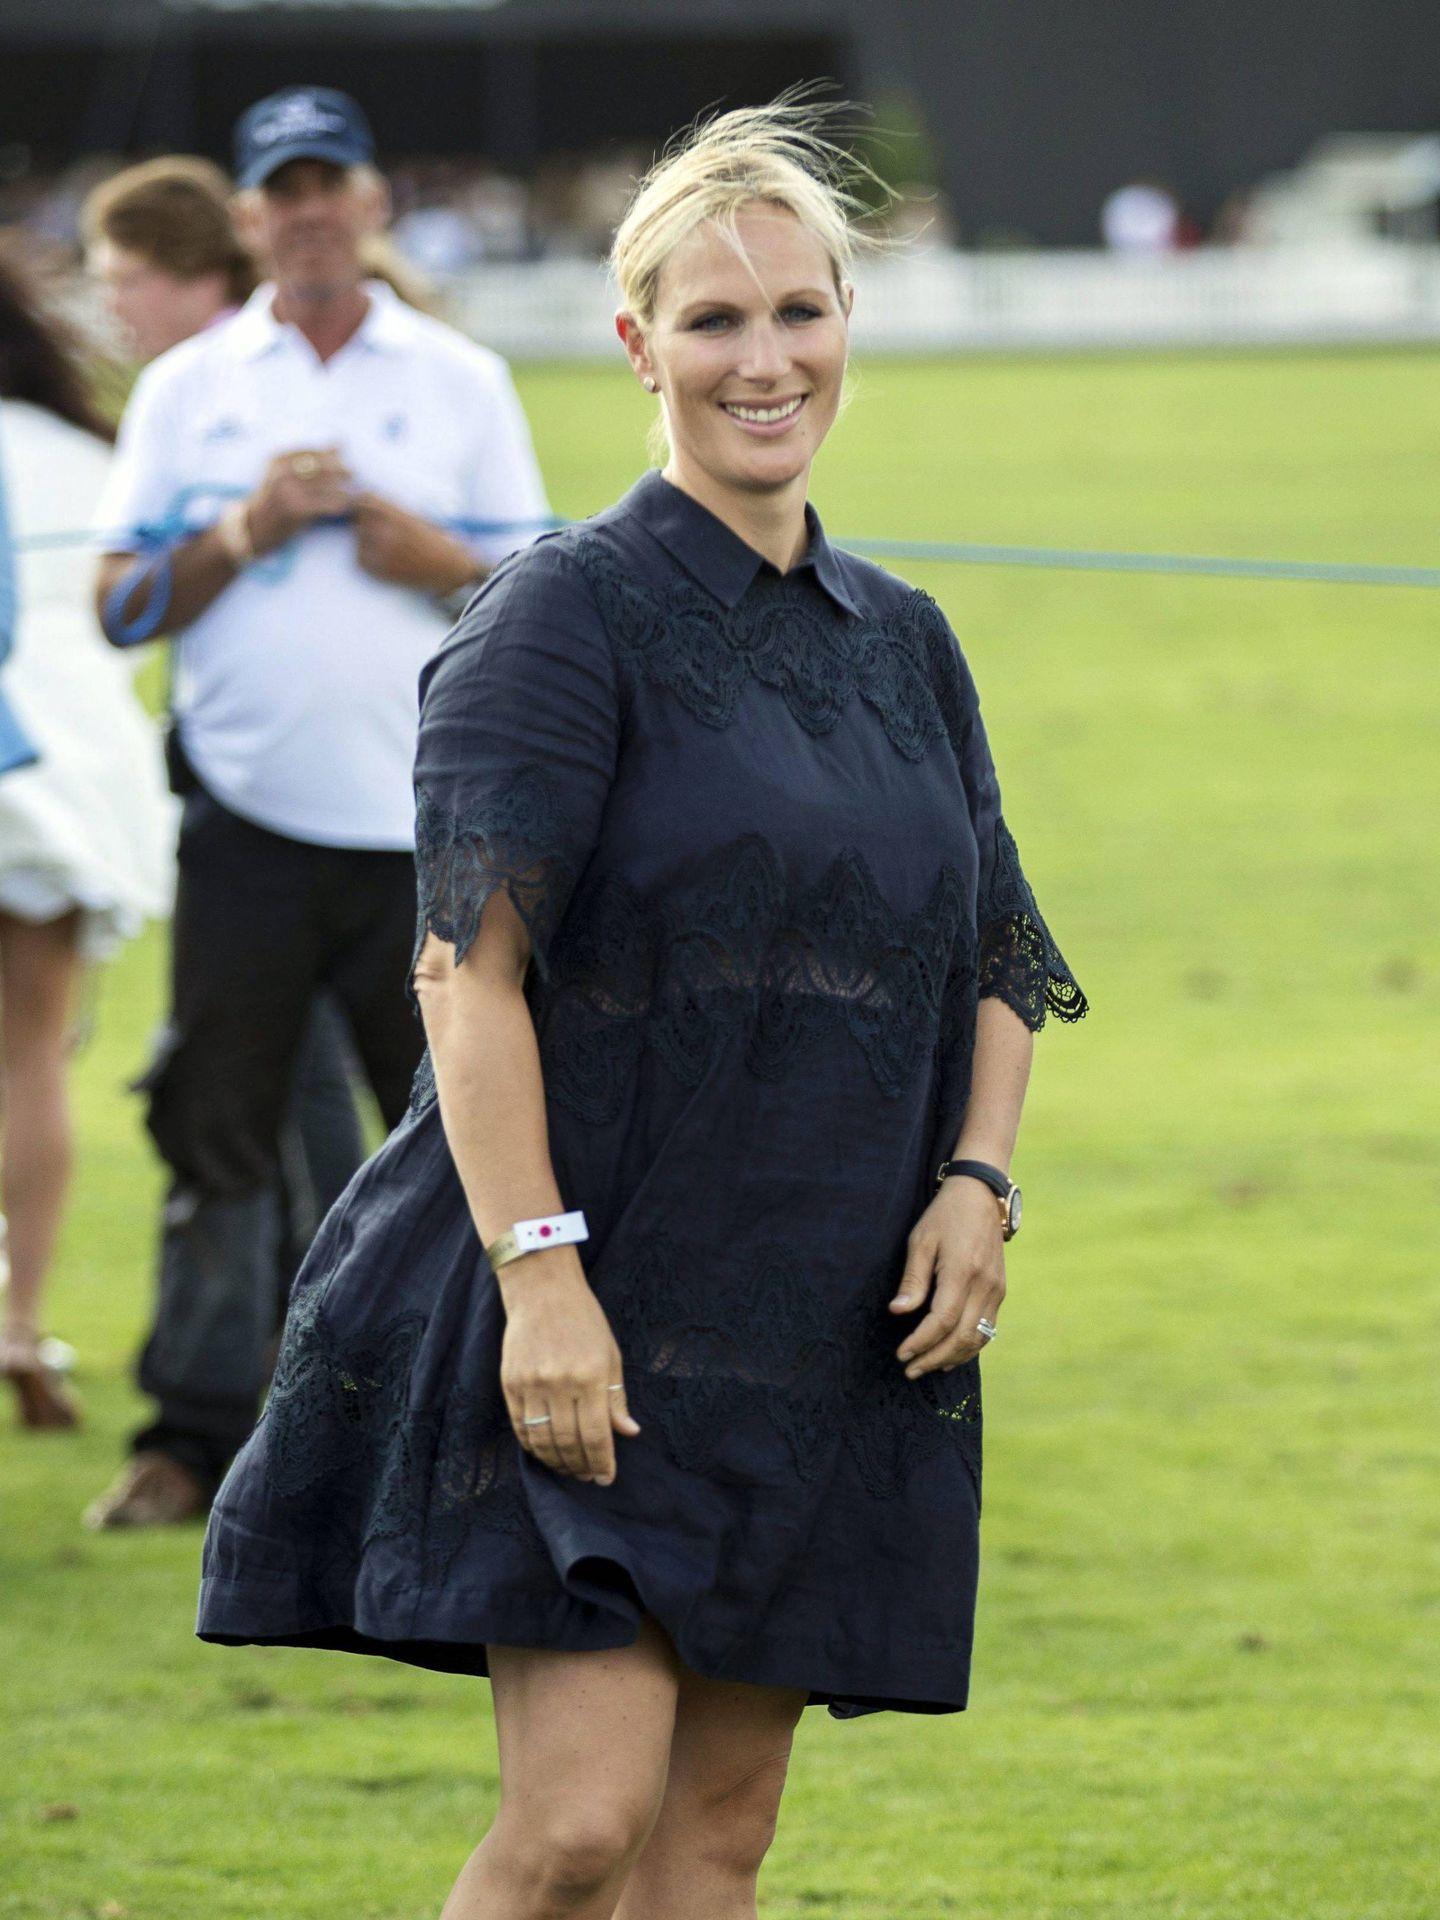 Zara Tindall en 2018, embarazada de su segunda hija. (Cordon Press)